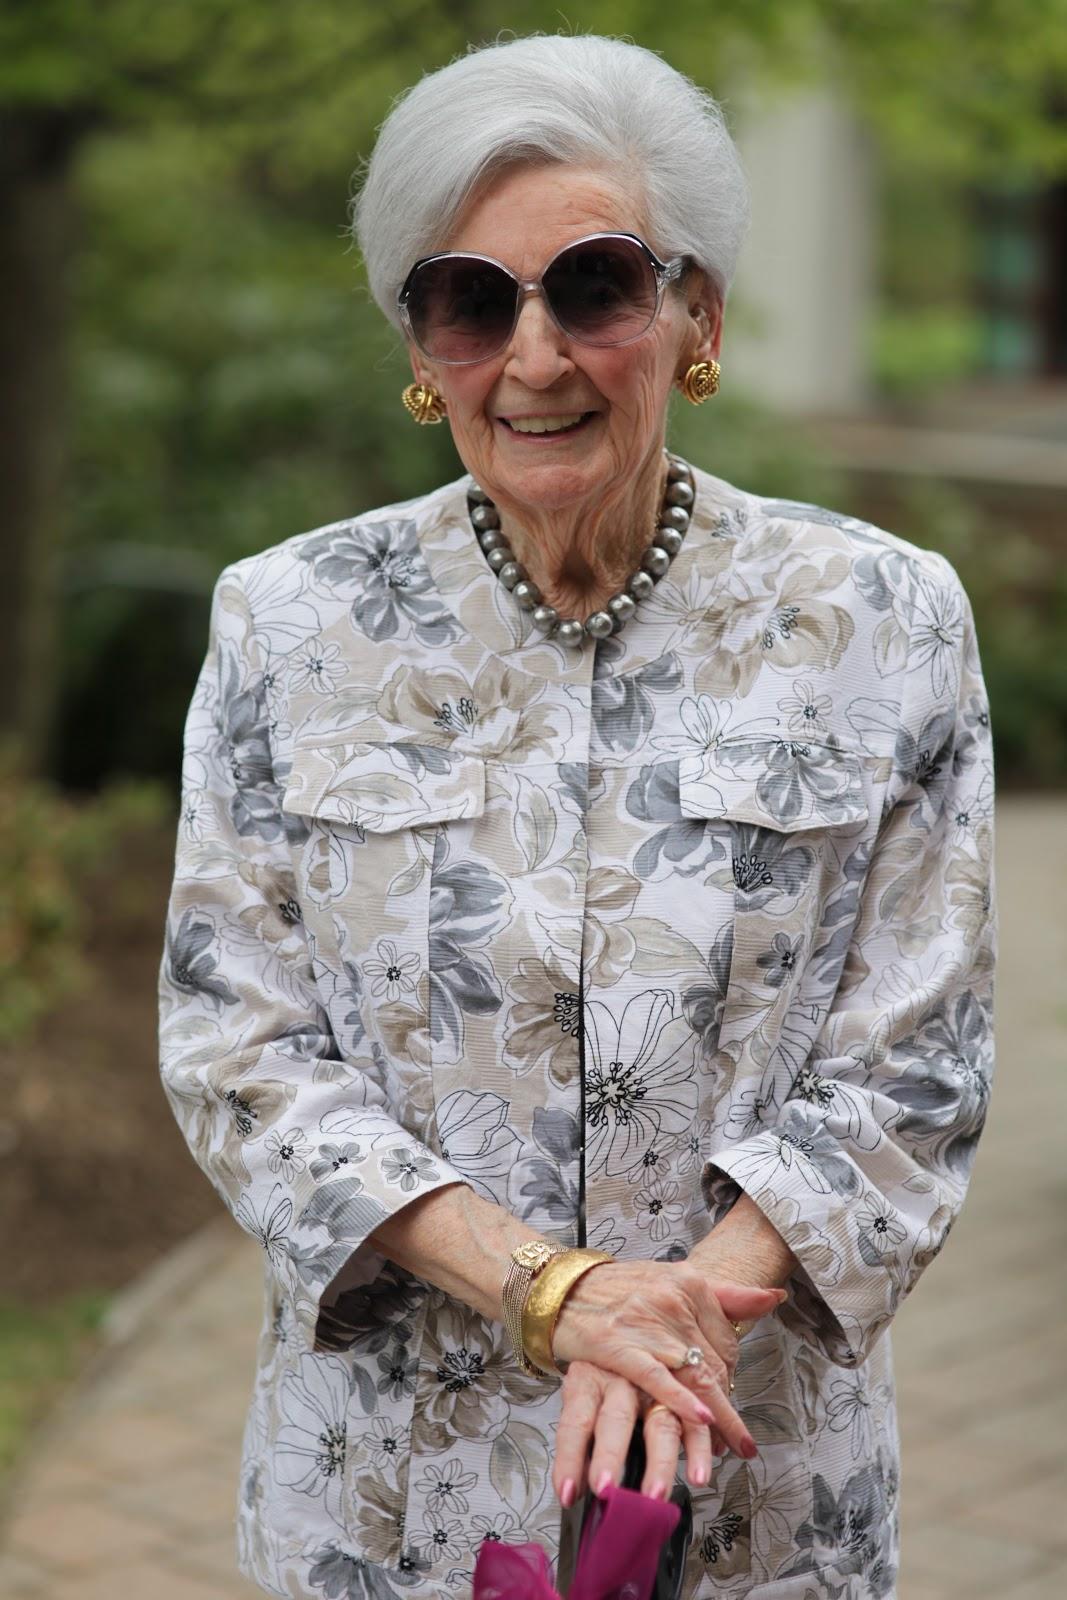 Old lady fashion show 78